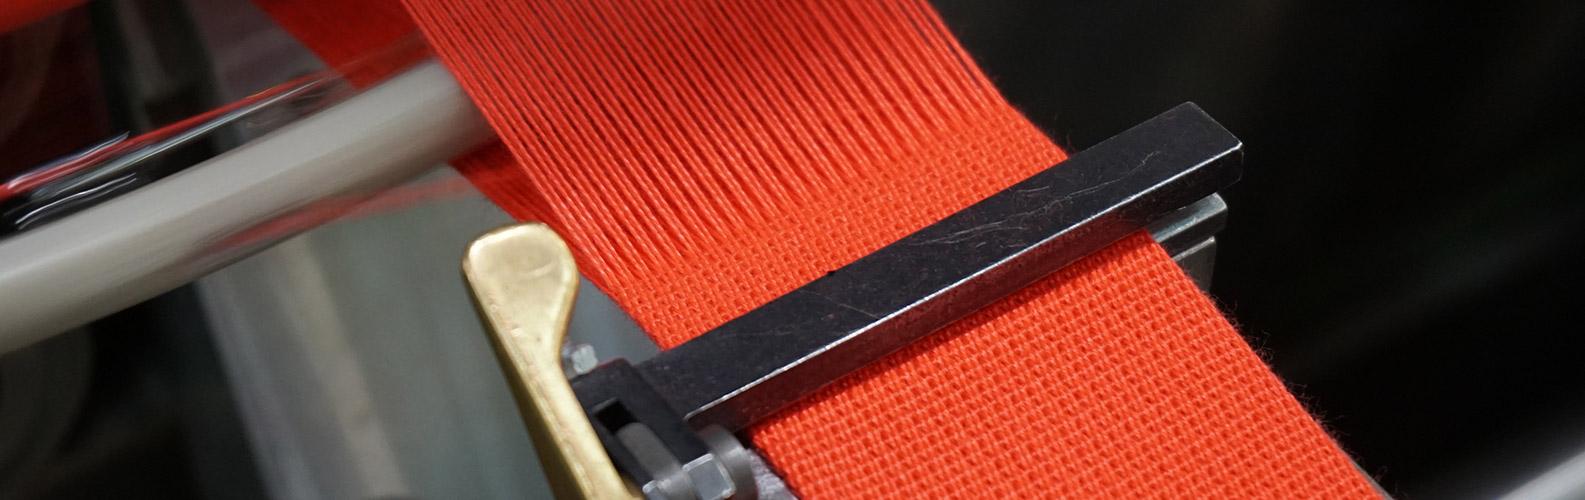 jtti group tissage de sangles cordons sur m tier tisser navette. Black Bedroom Furniture Sets. Home Design Ideas